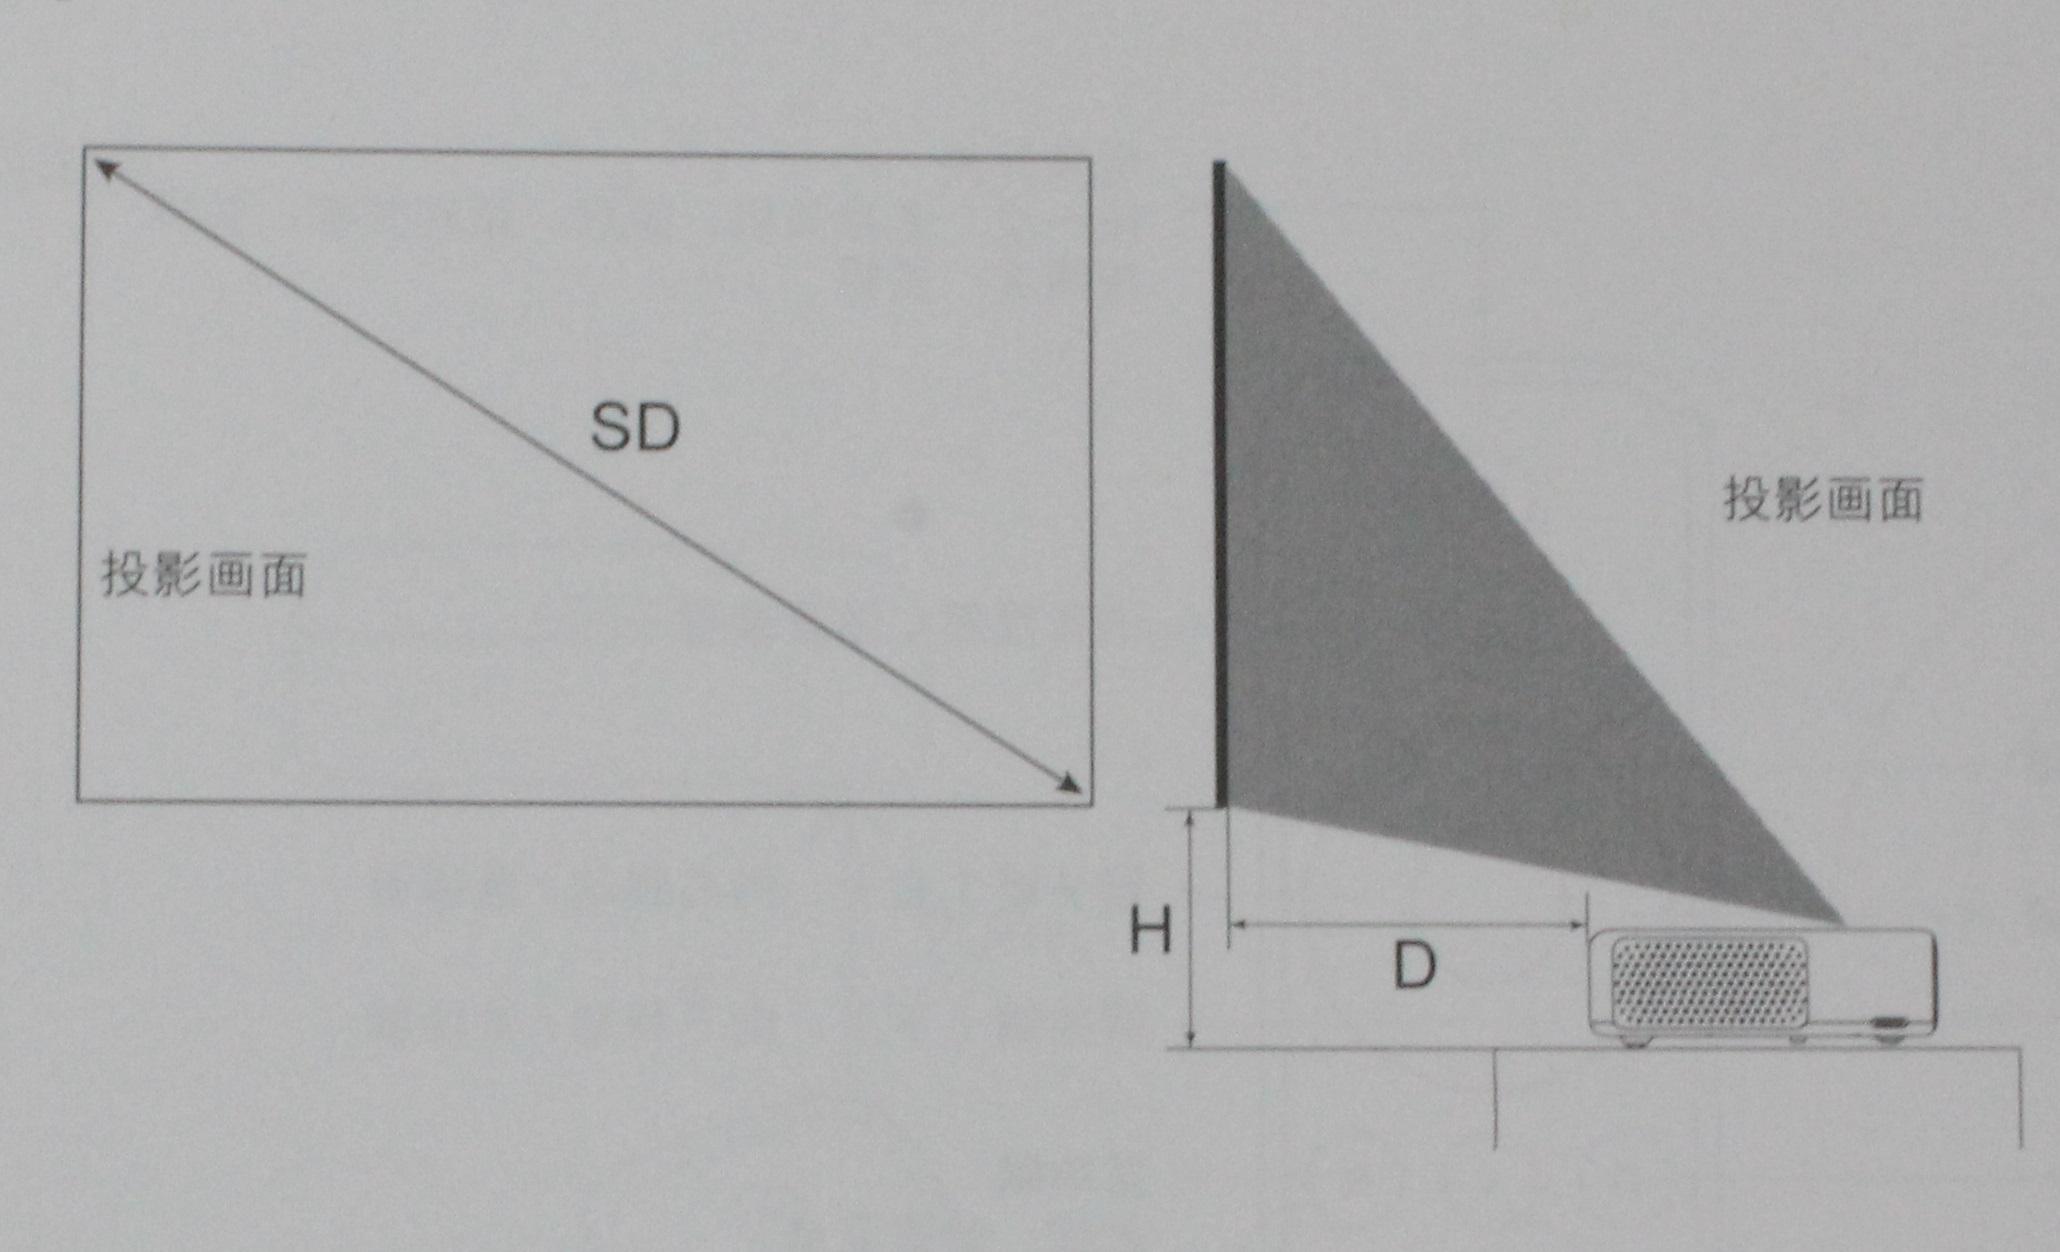 fot de la diagonal necesaria para el proyector